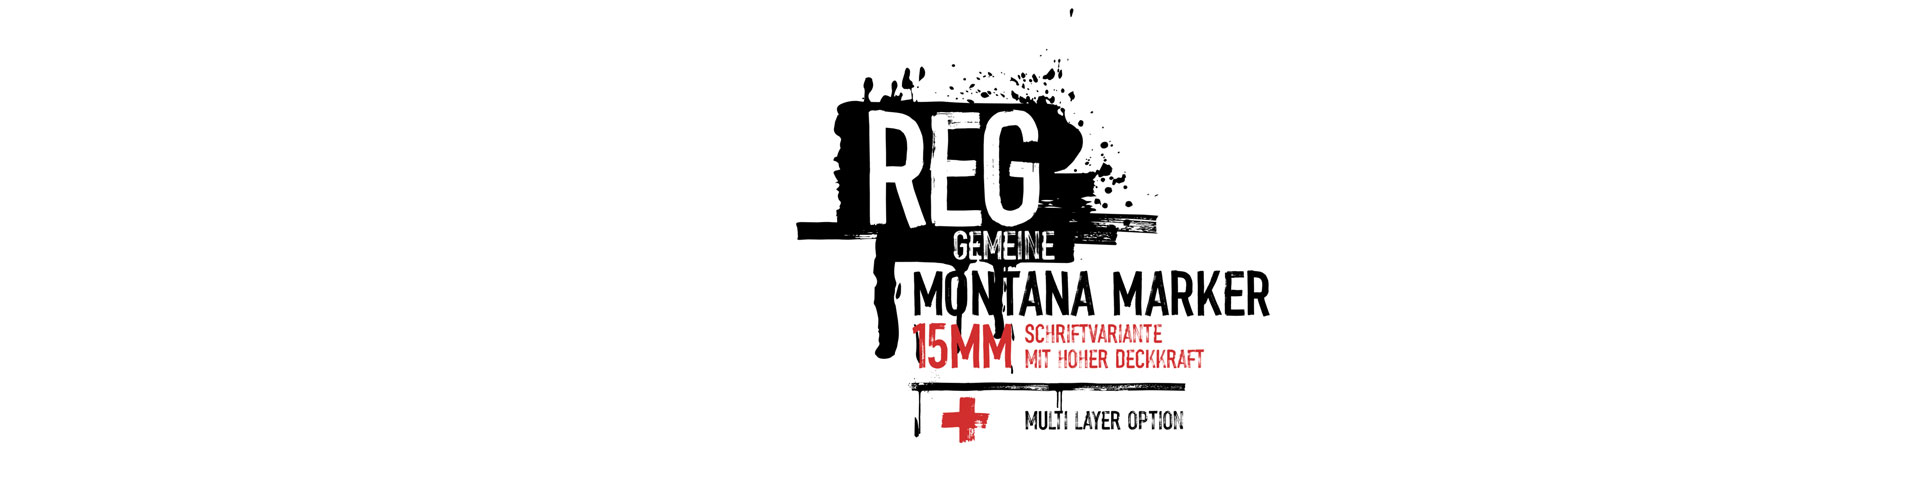 Montana_04